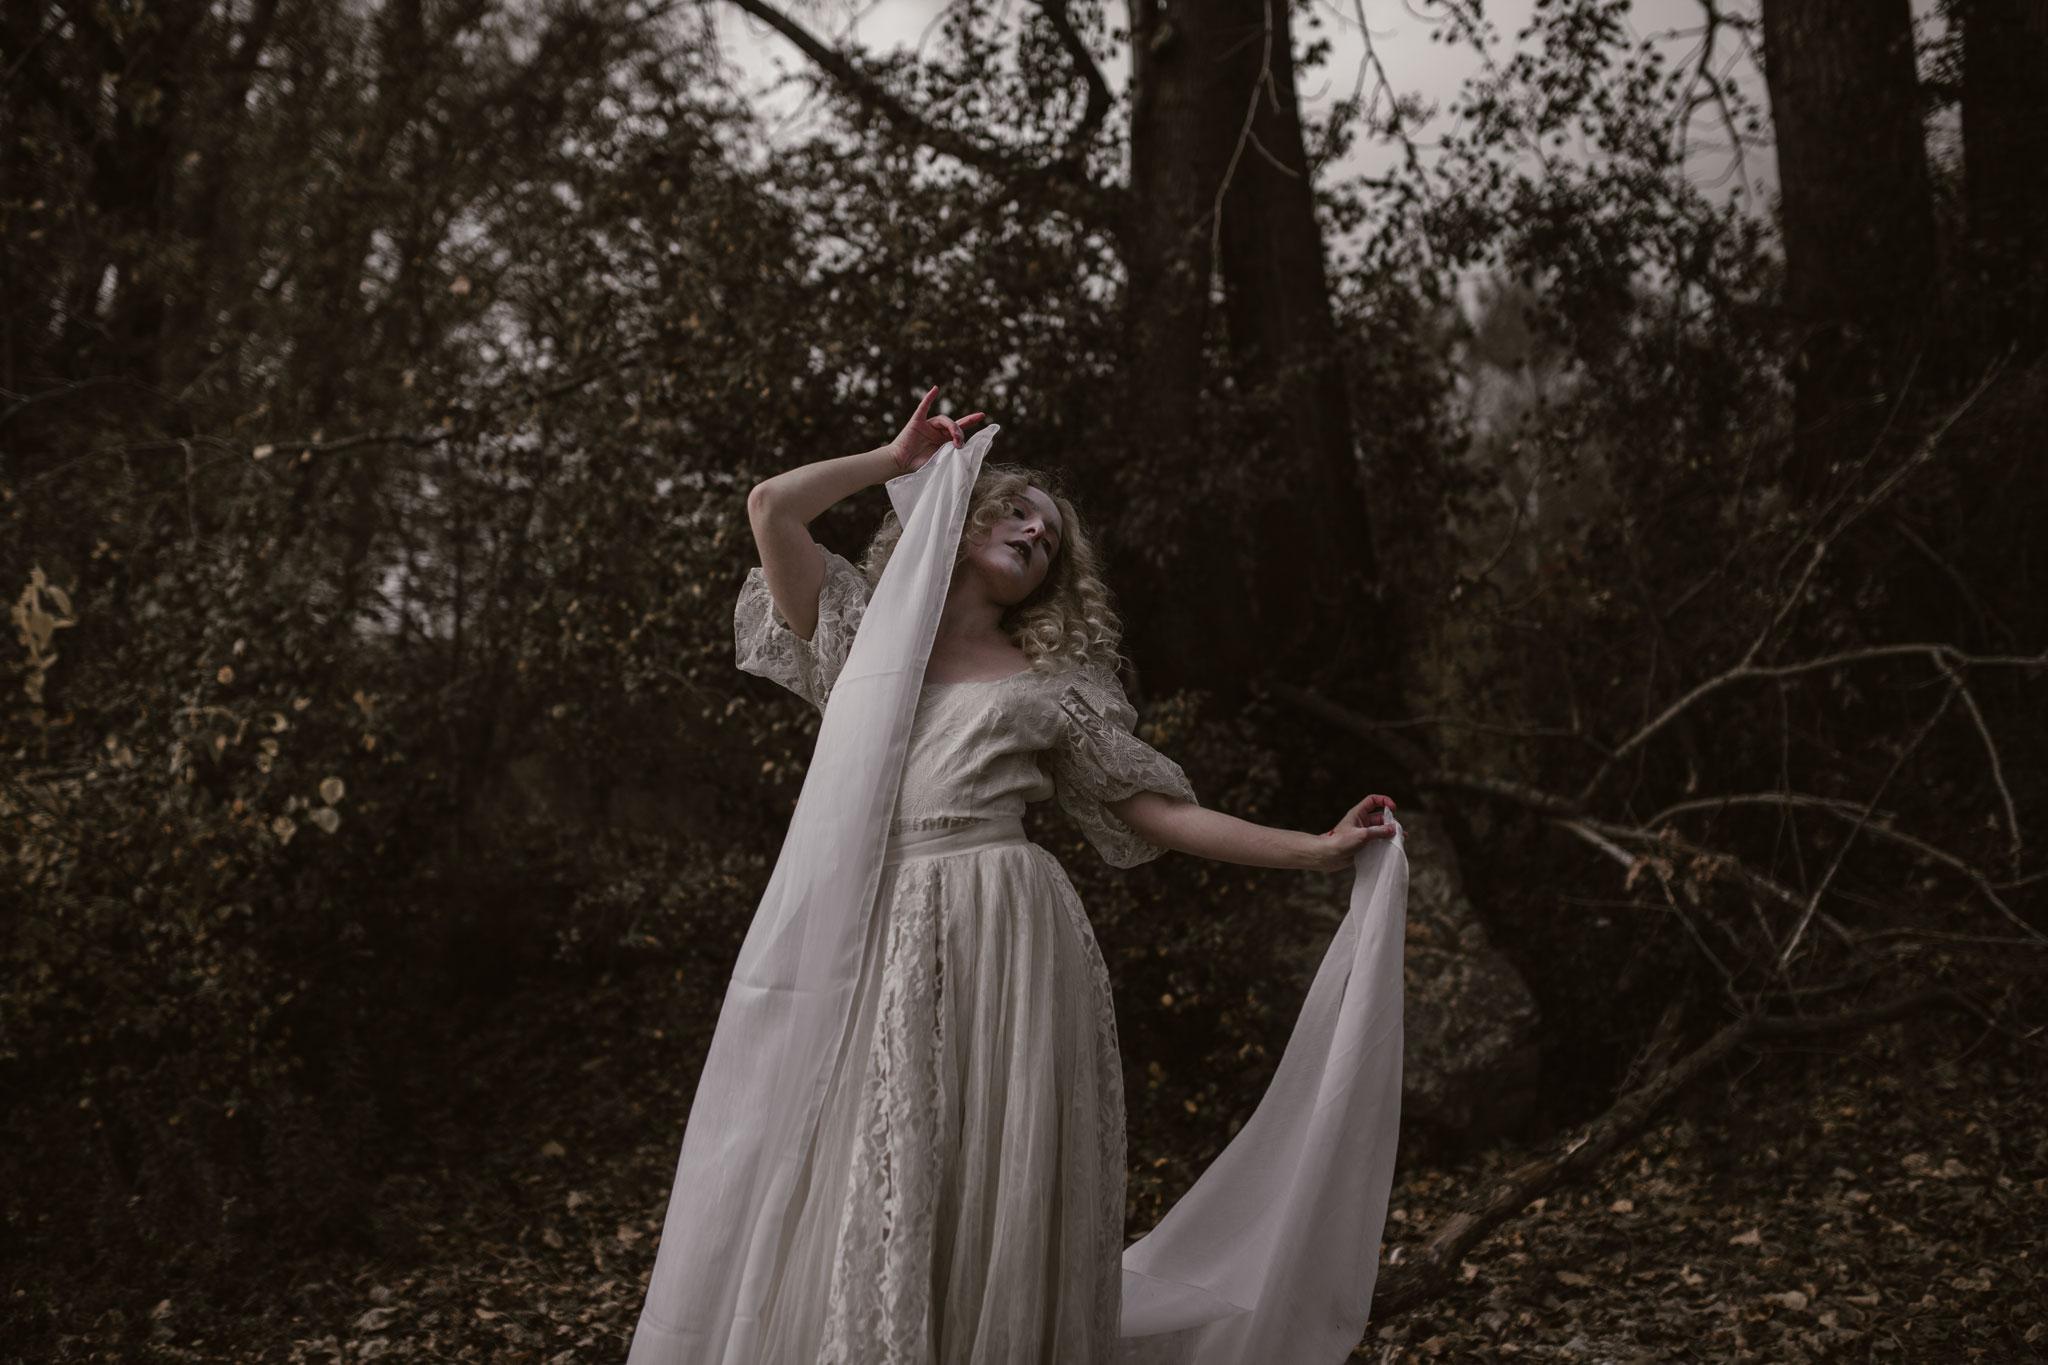 pale-witch-214fb.jpg